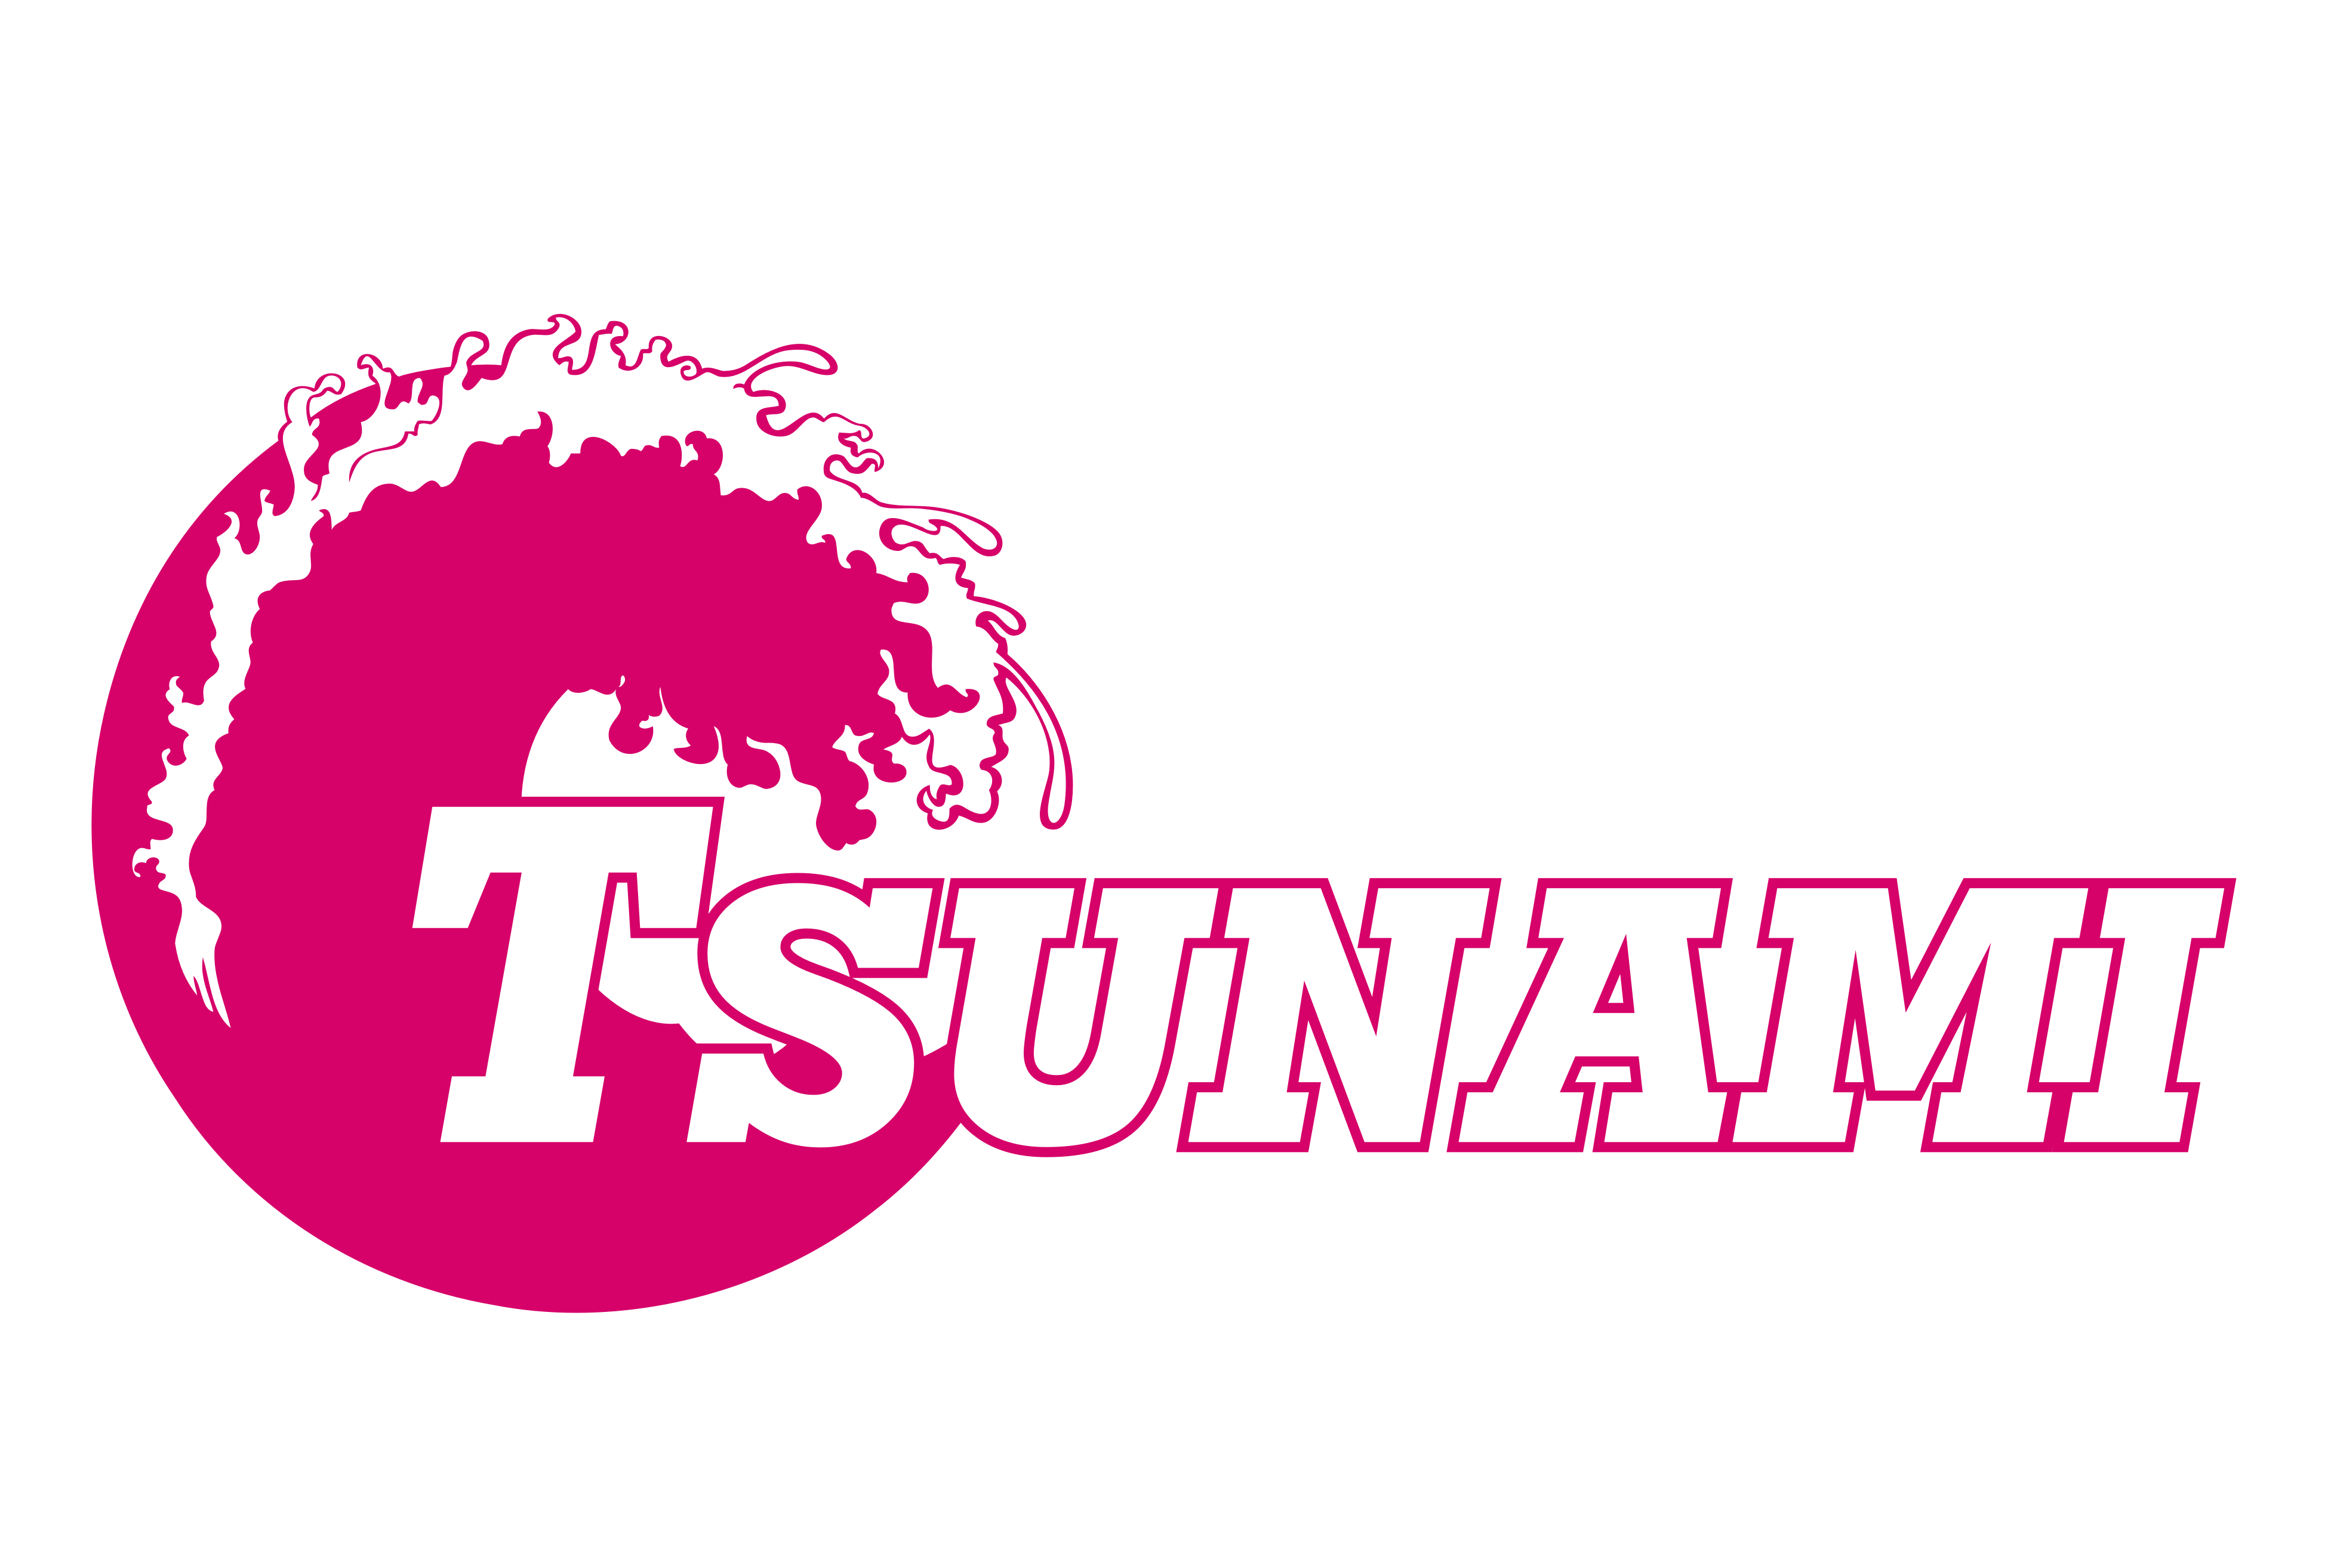 Somerville Tsunami 18B